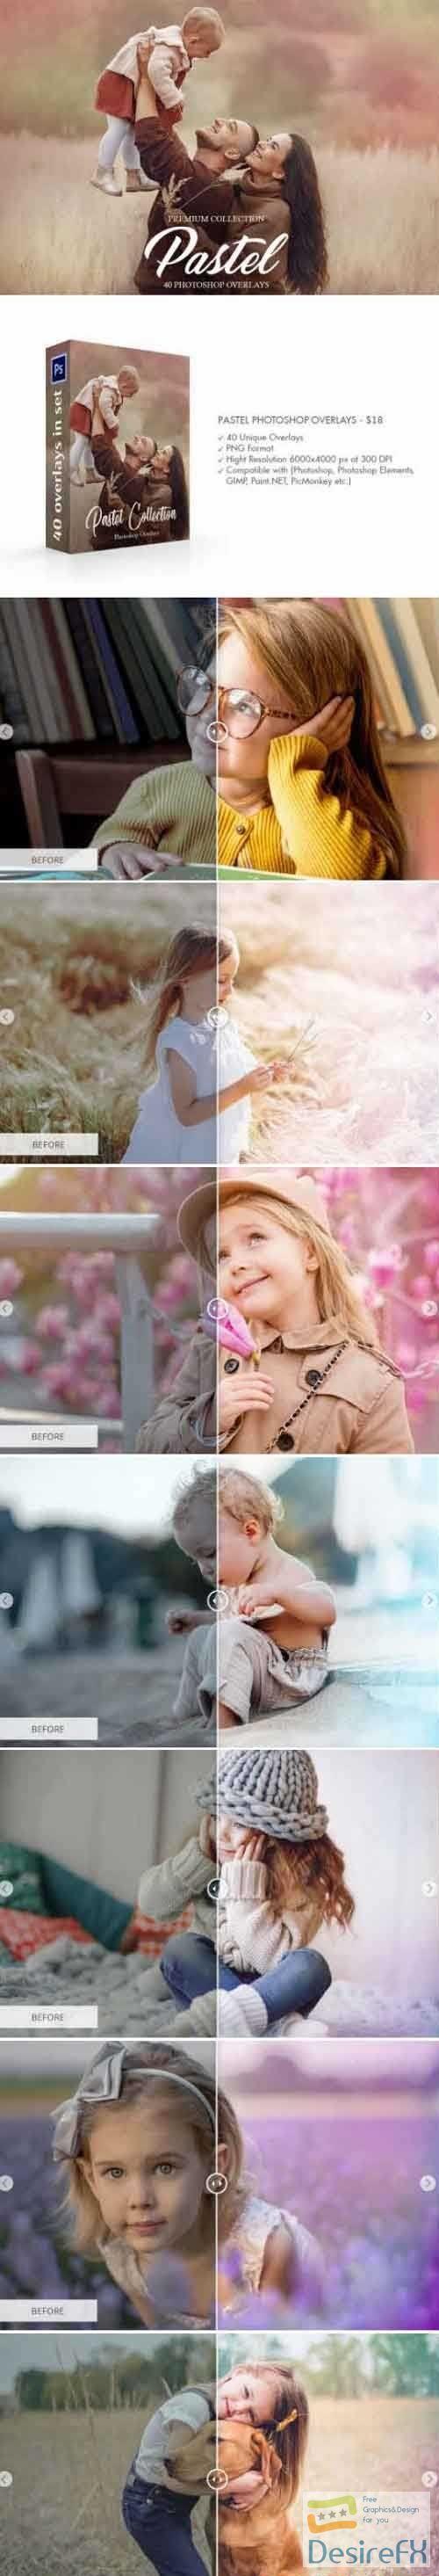 Pastel Overlays Photoshop 4737126